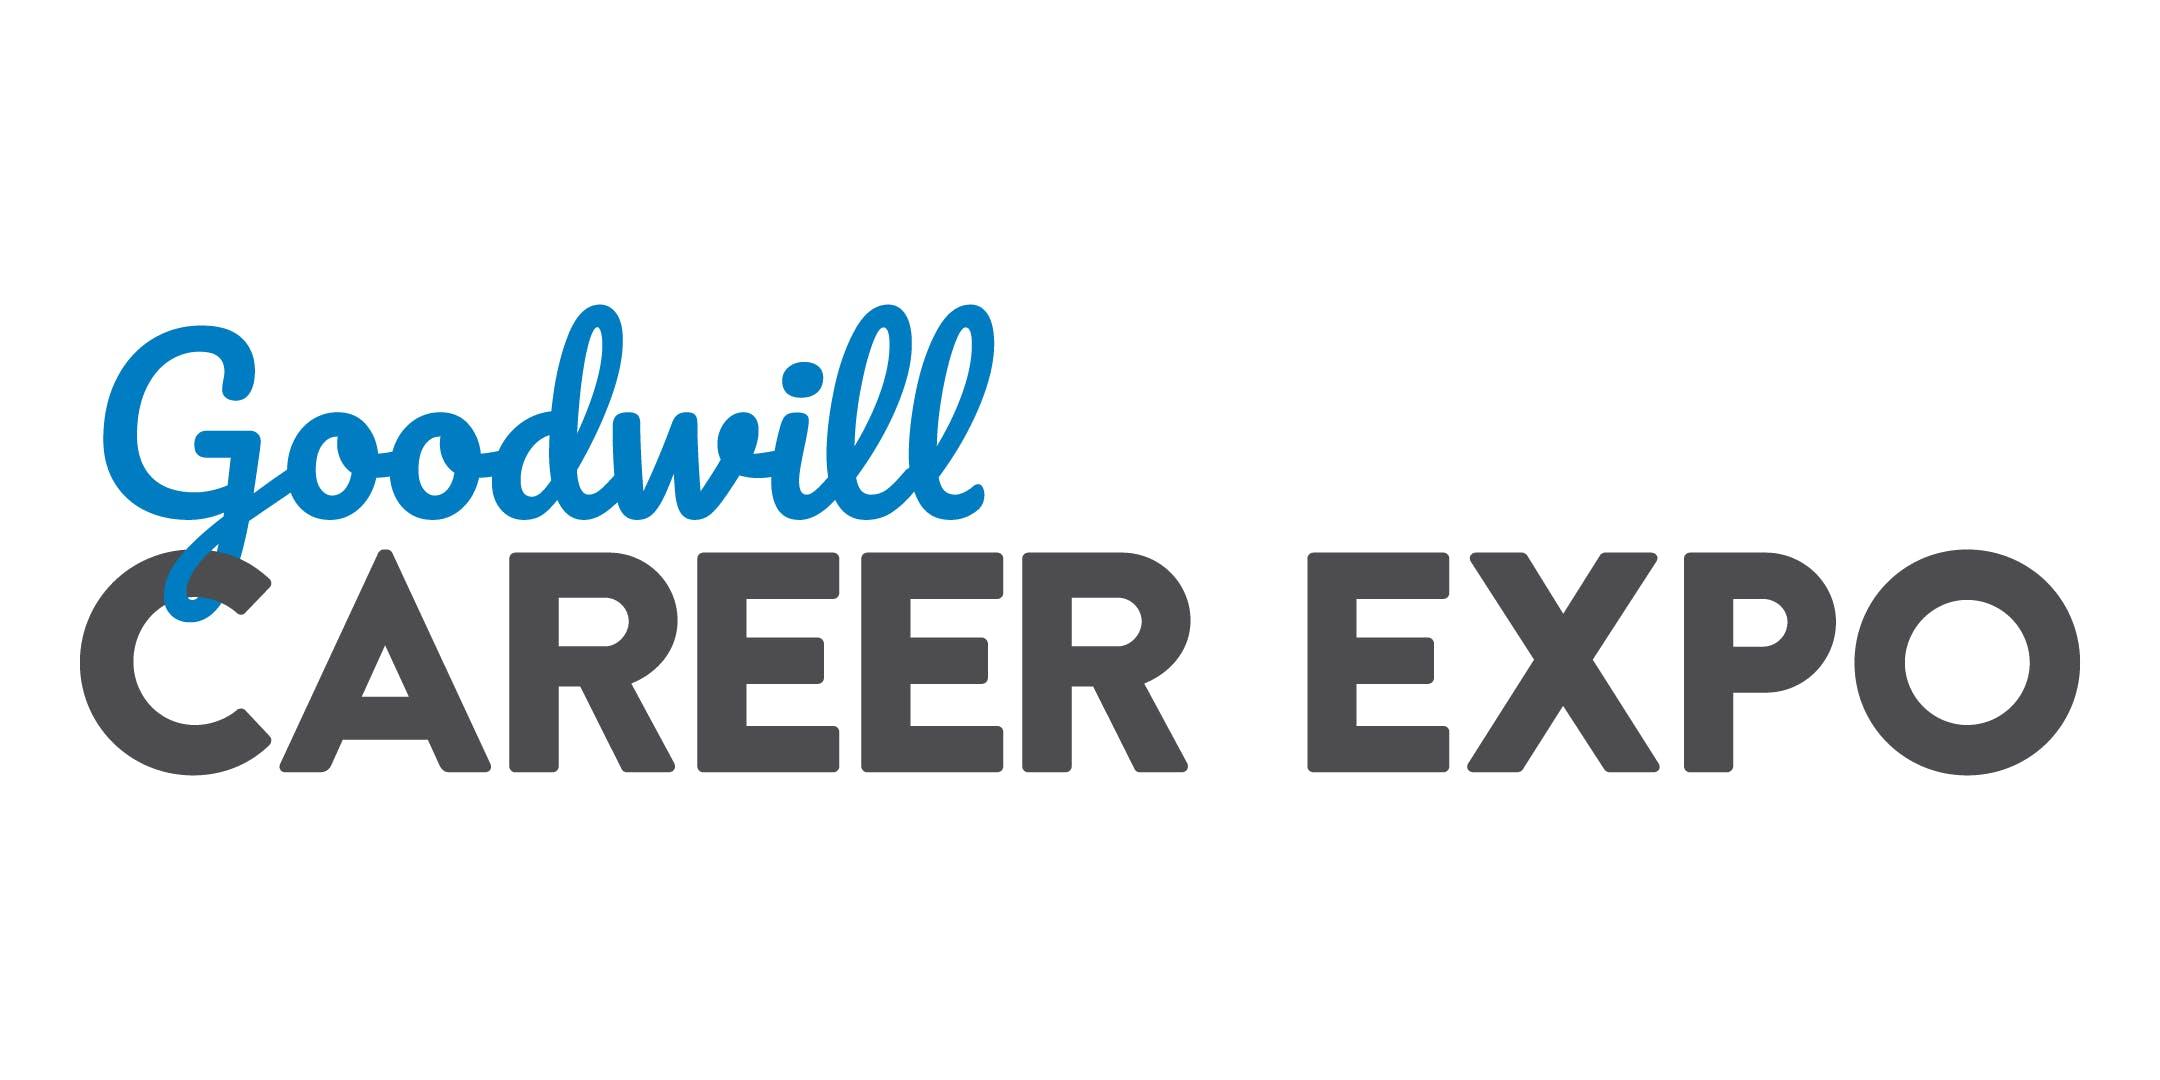 Goodwill Career Expo Employer Registration